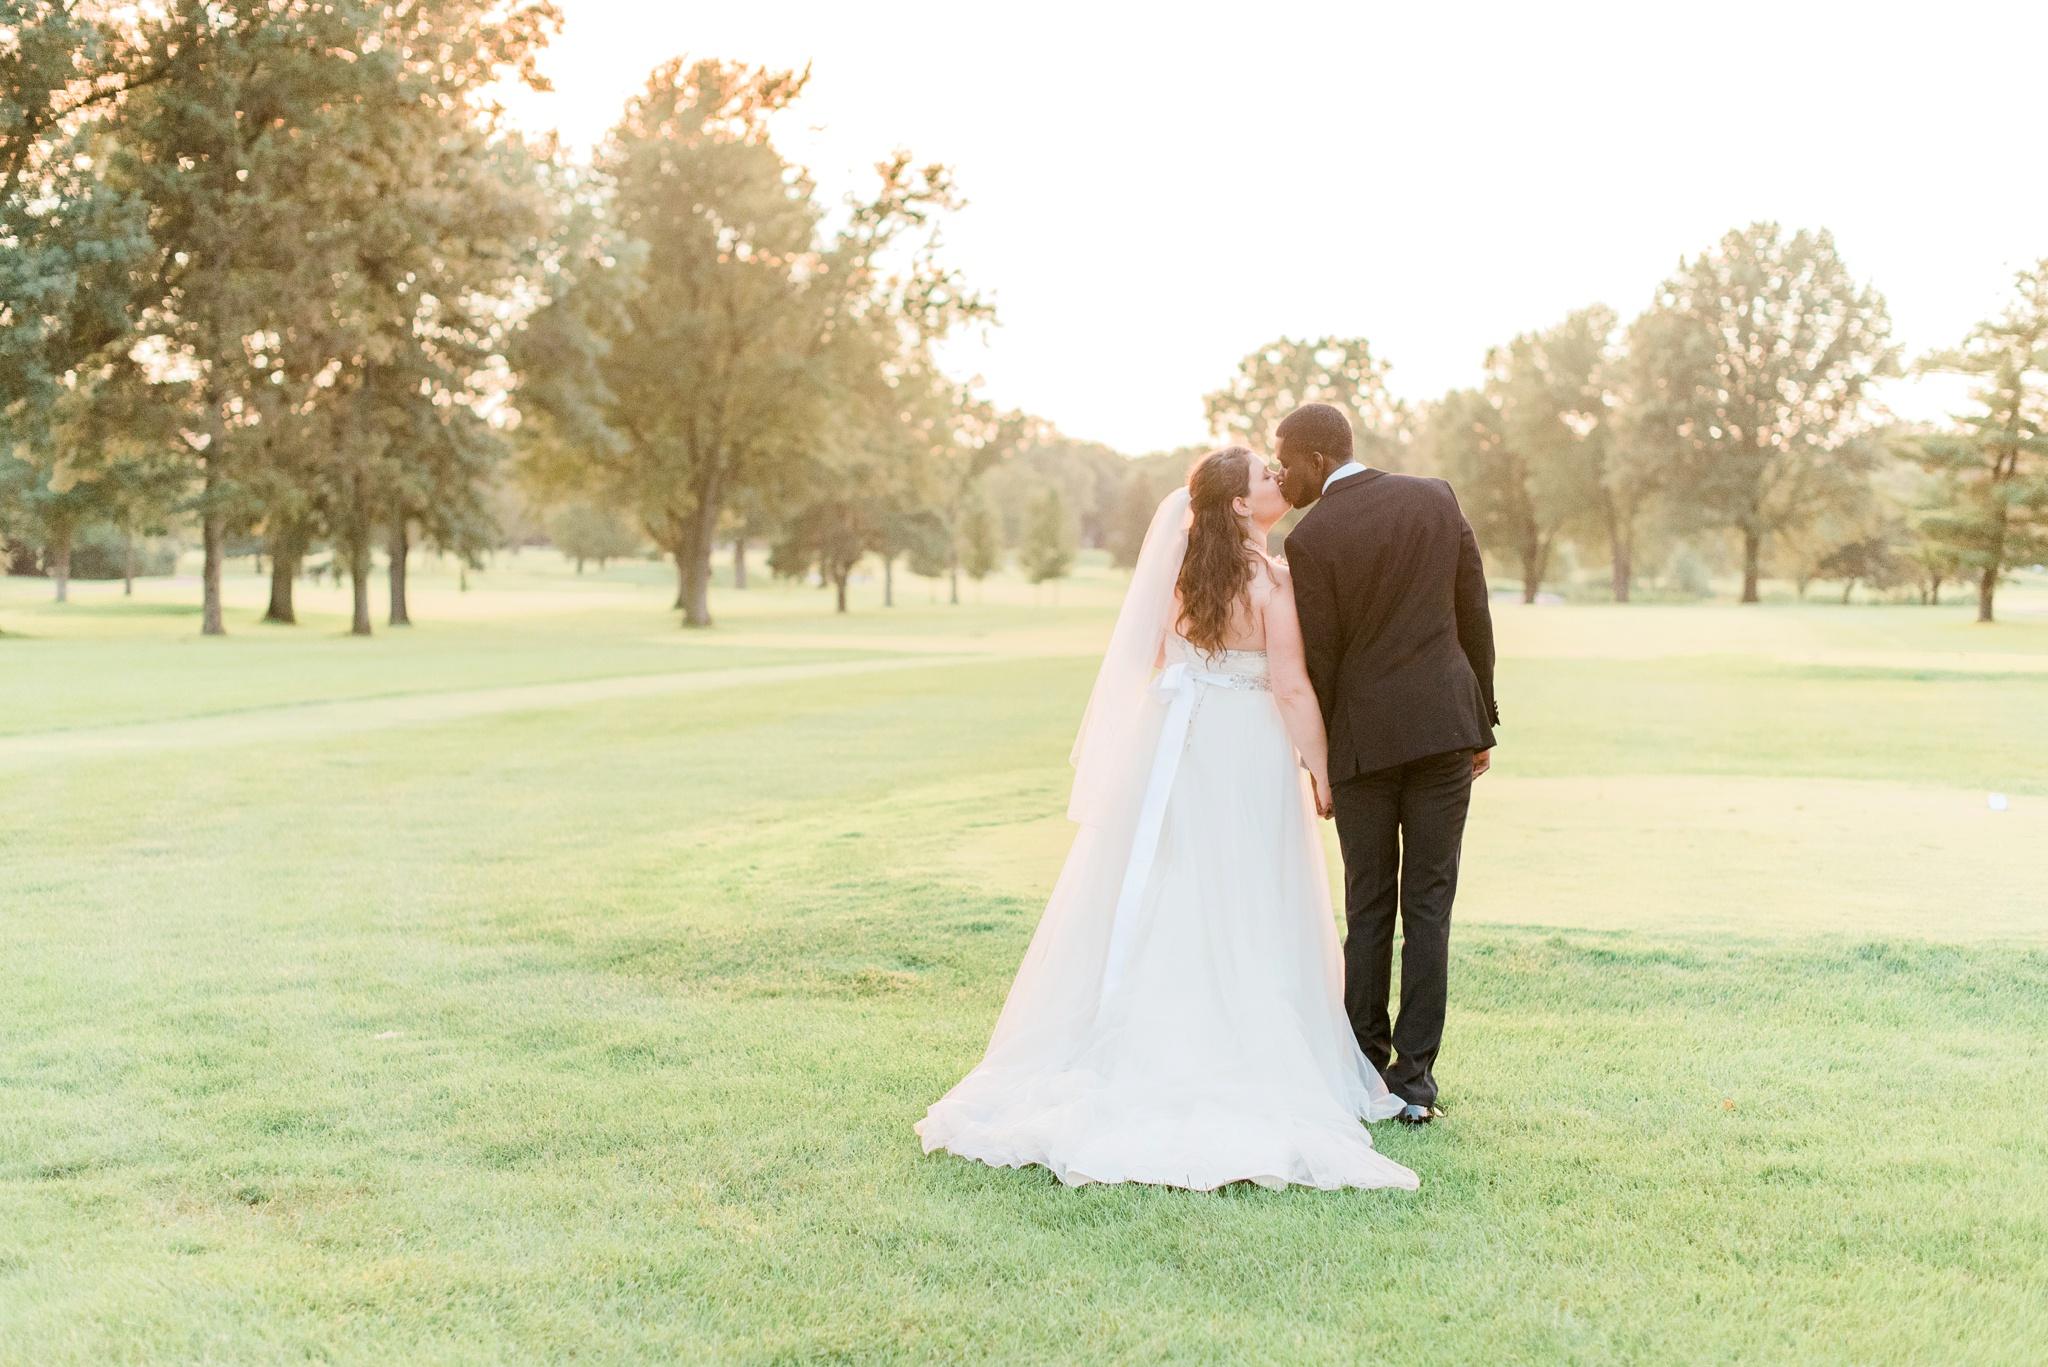 worthington-hills-country-club-wedding-columbus-ohio-meg-evan_0115.jpg